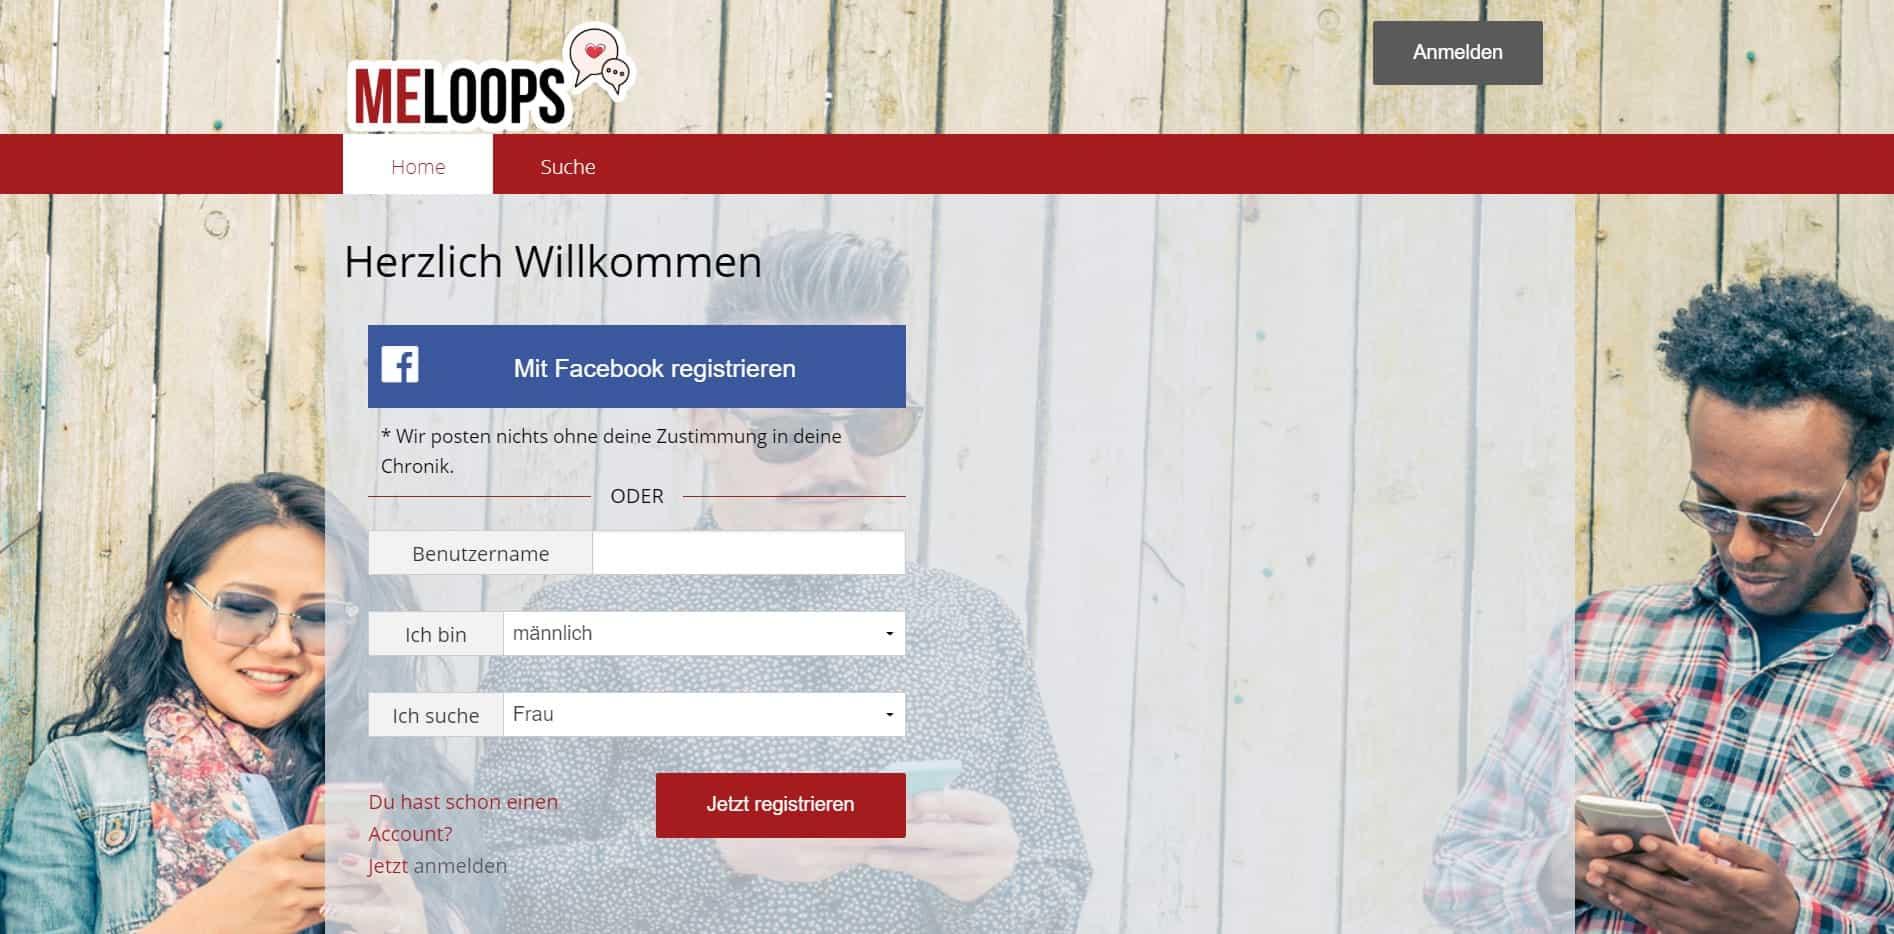 Testbericht: Meloops.com Abzocke